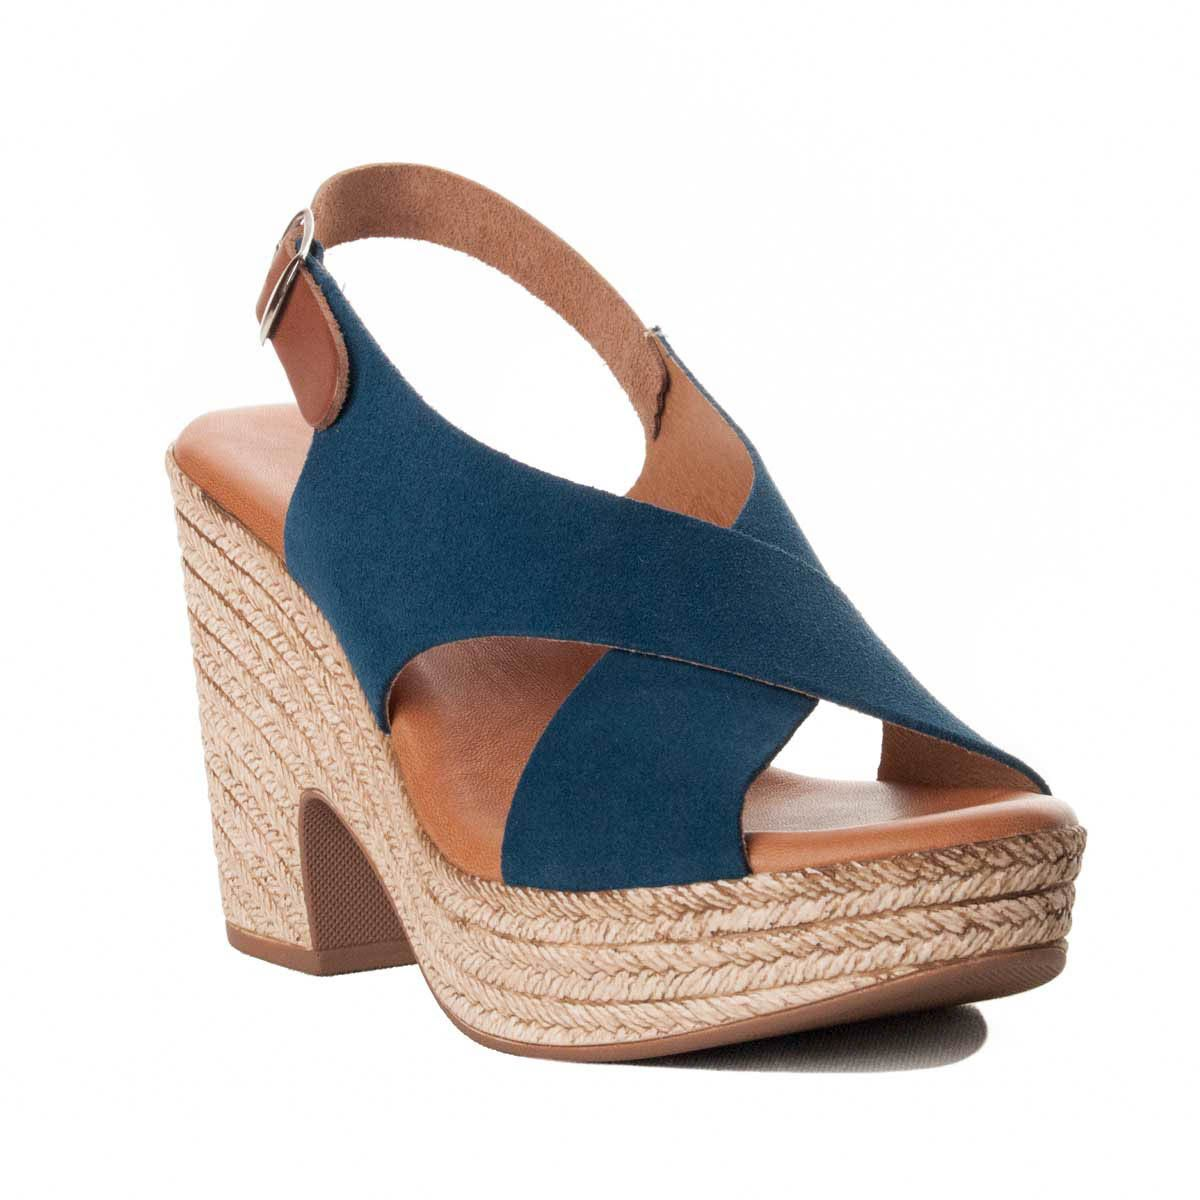 Purapiel Chunky Heel Sandal in Blue